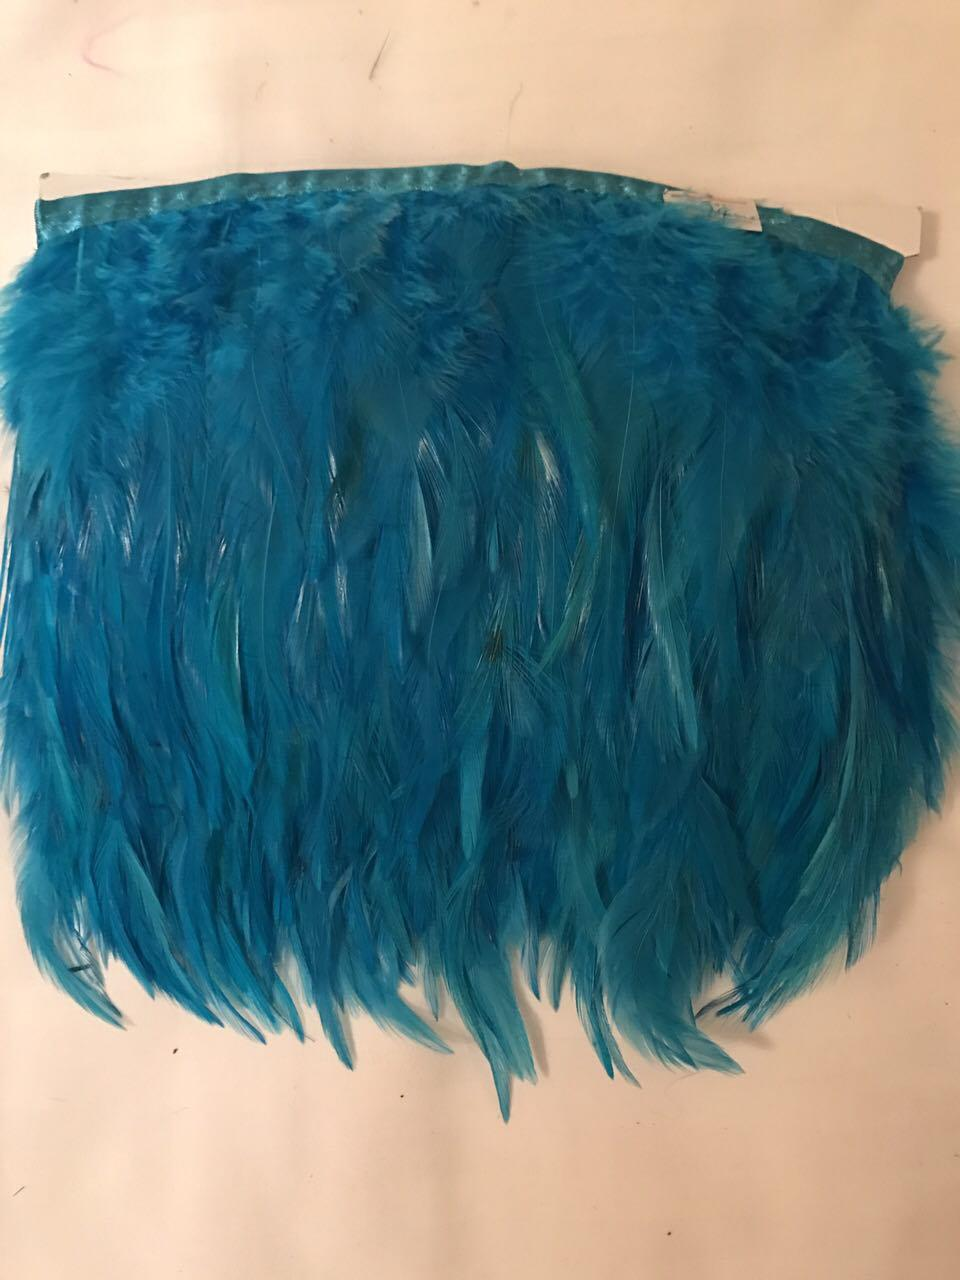 Перьевая тесьма из перьев петуха.Цвет голубойЦена за 0,5м